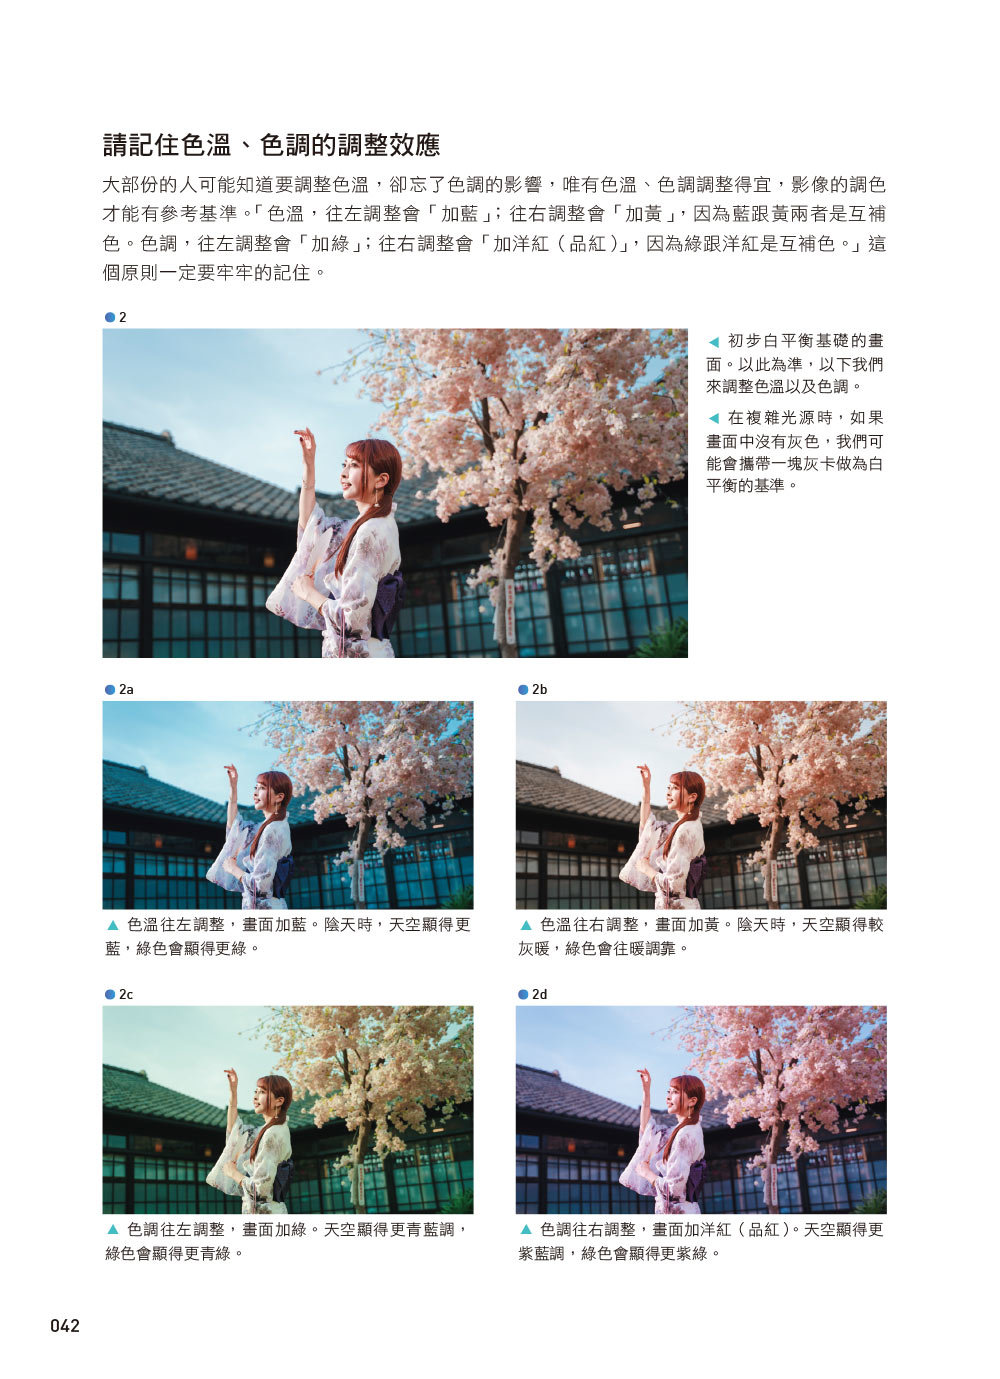 Lightroom Classic 魅力人像修圖經典版|調光調色x美膚秘訣x日系風x韓式婚紗-preview-4